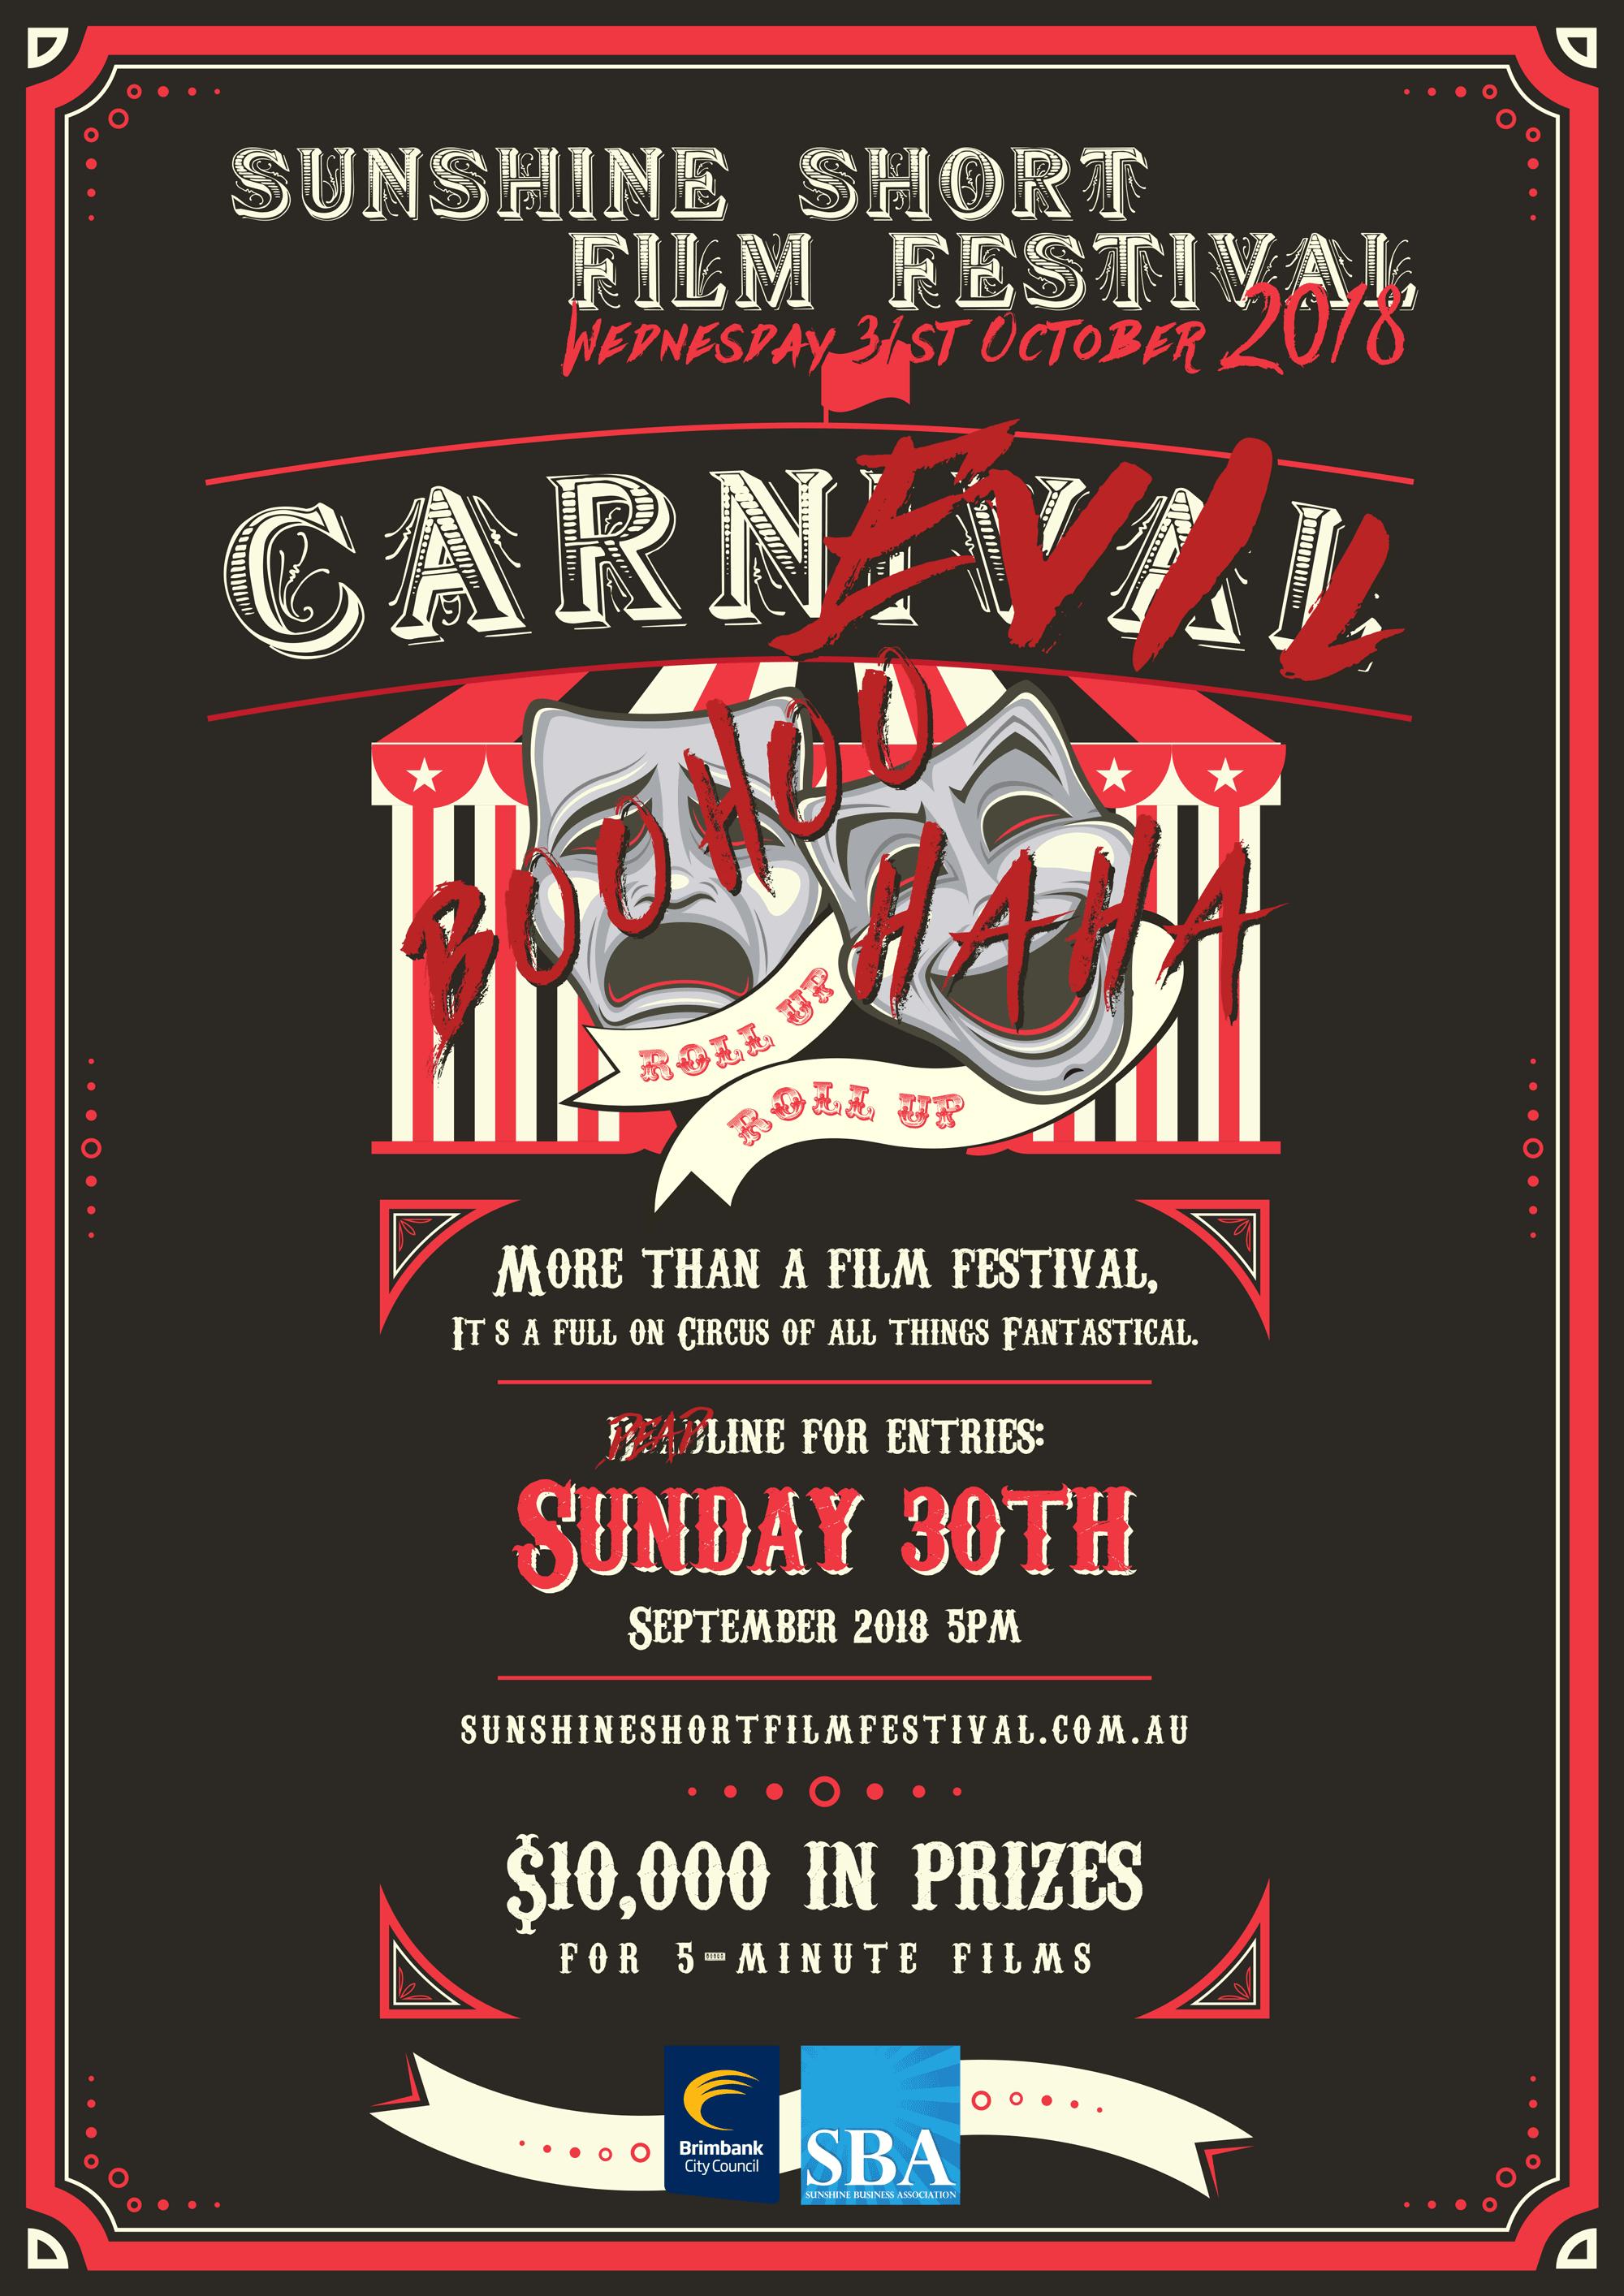 SSFF-2018-Carnevil-Poster-Concept-8[1]